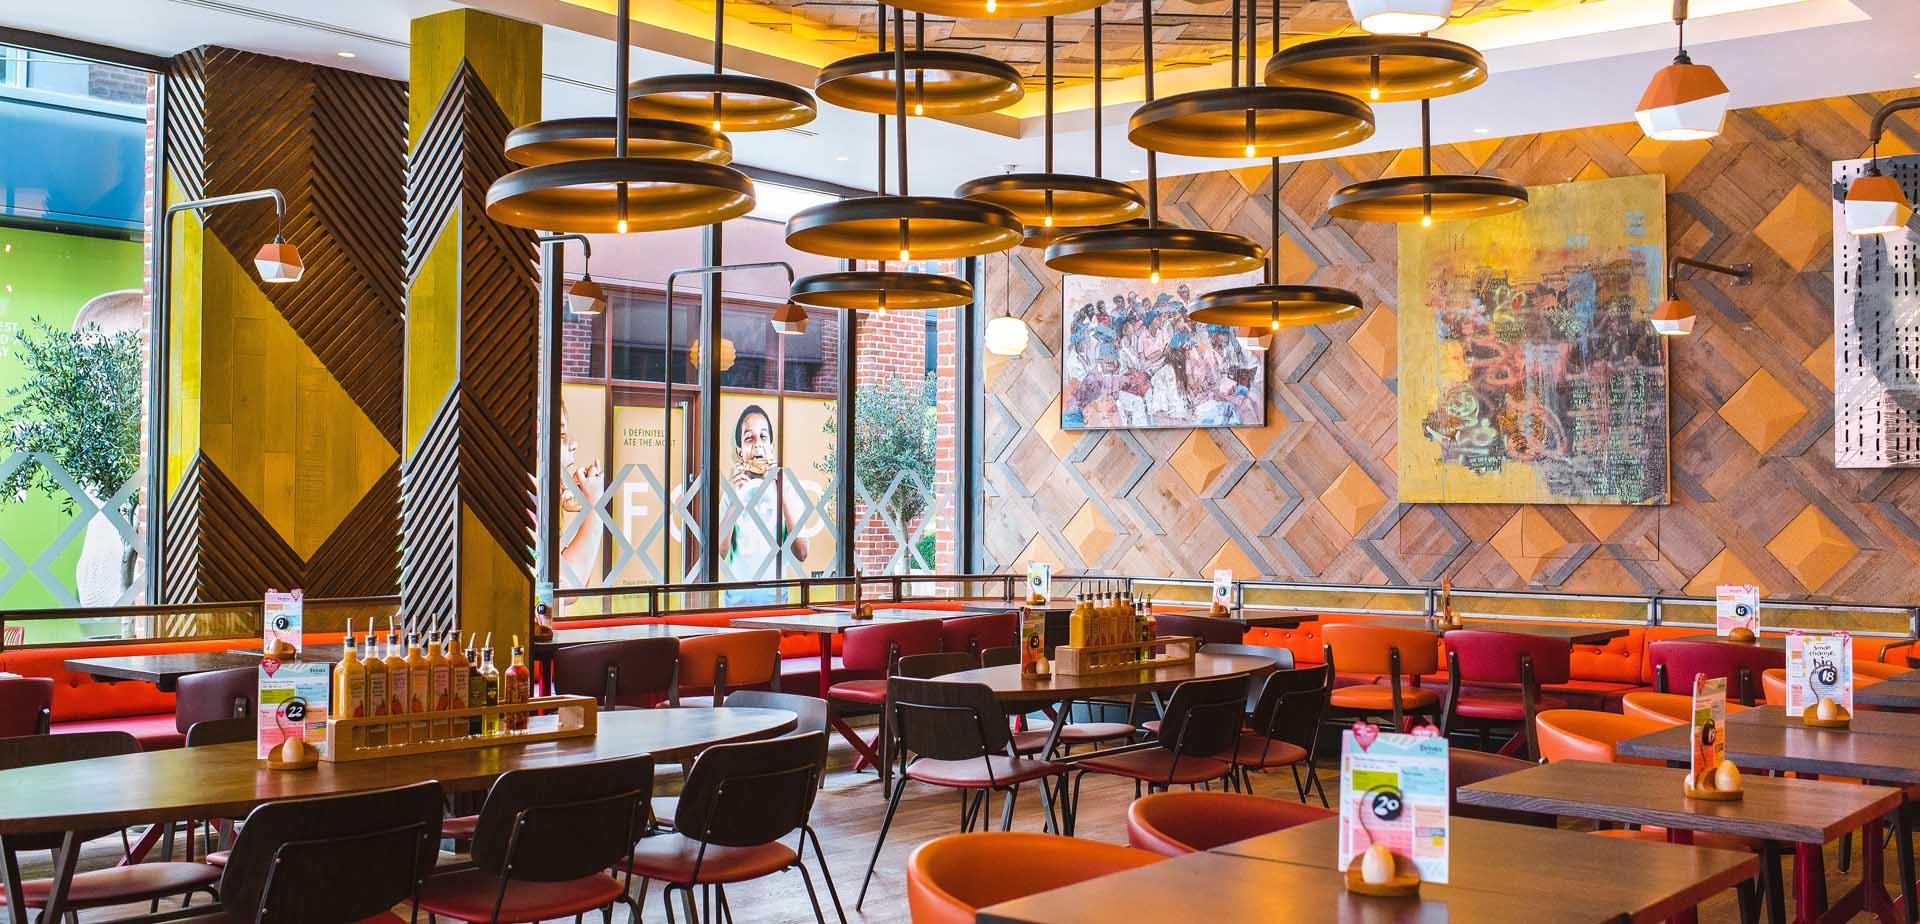 Nandos restaurant inside